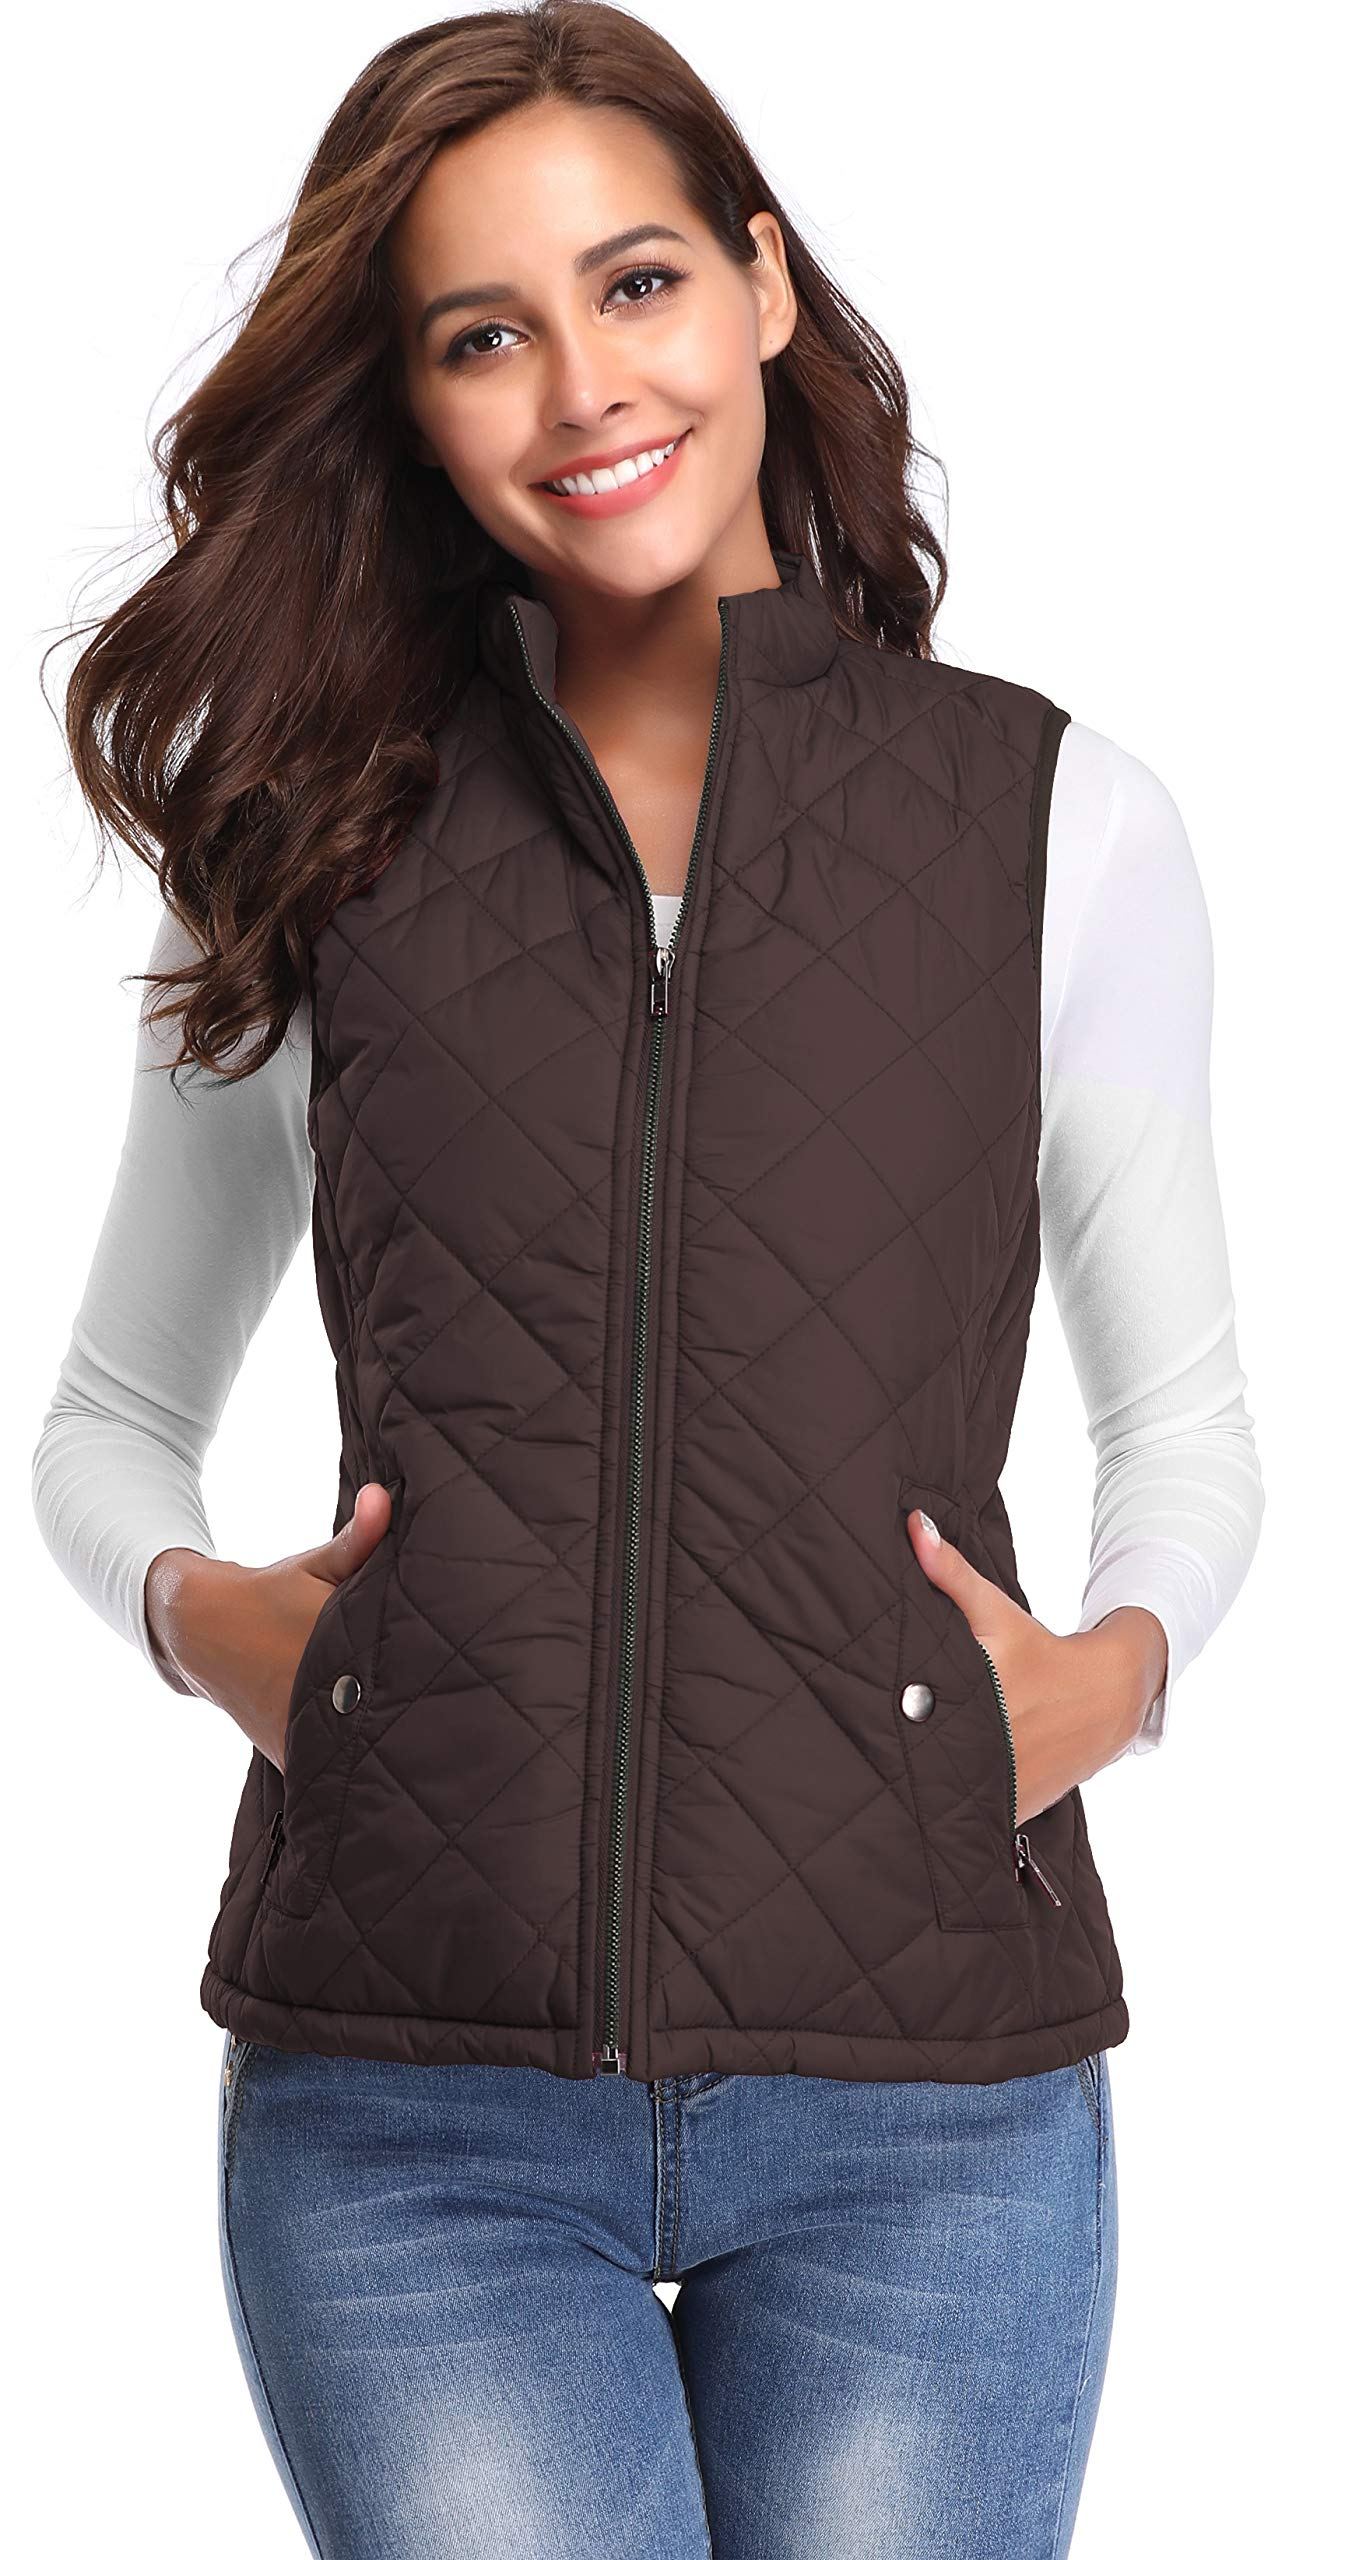 Argstar Women's Stand Collar Lightweight Padded Zip Vest Quilted Gilet